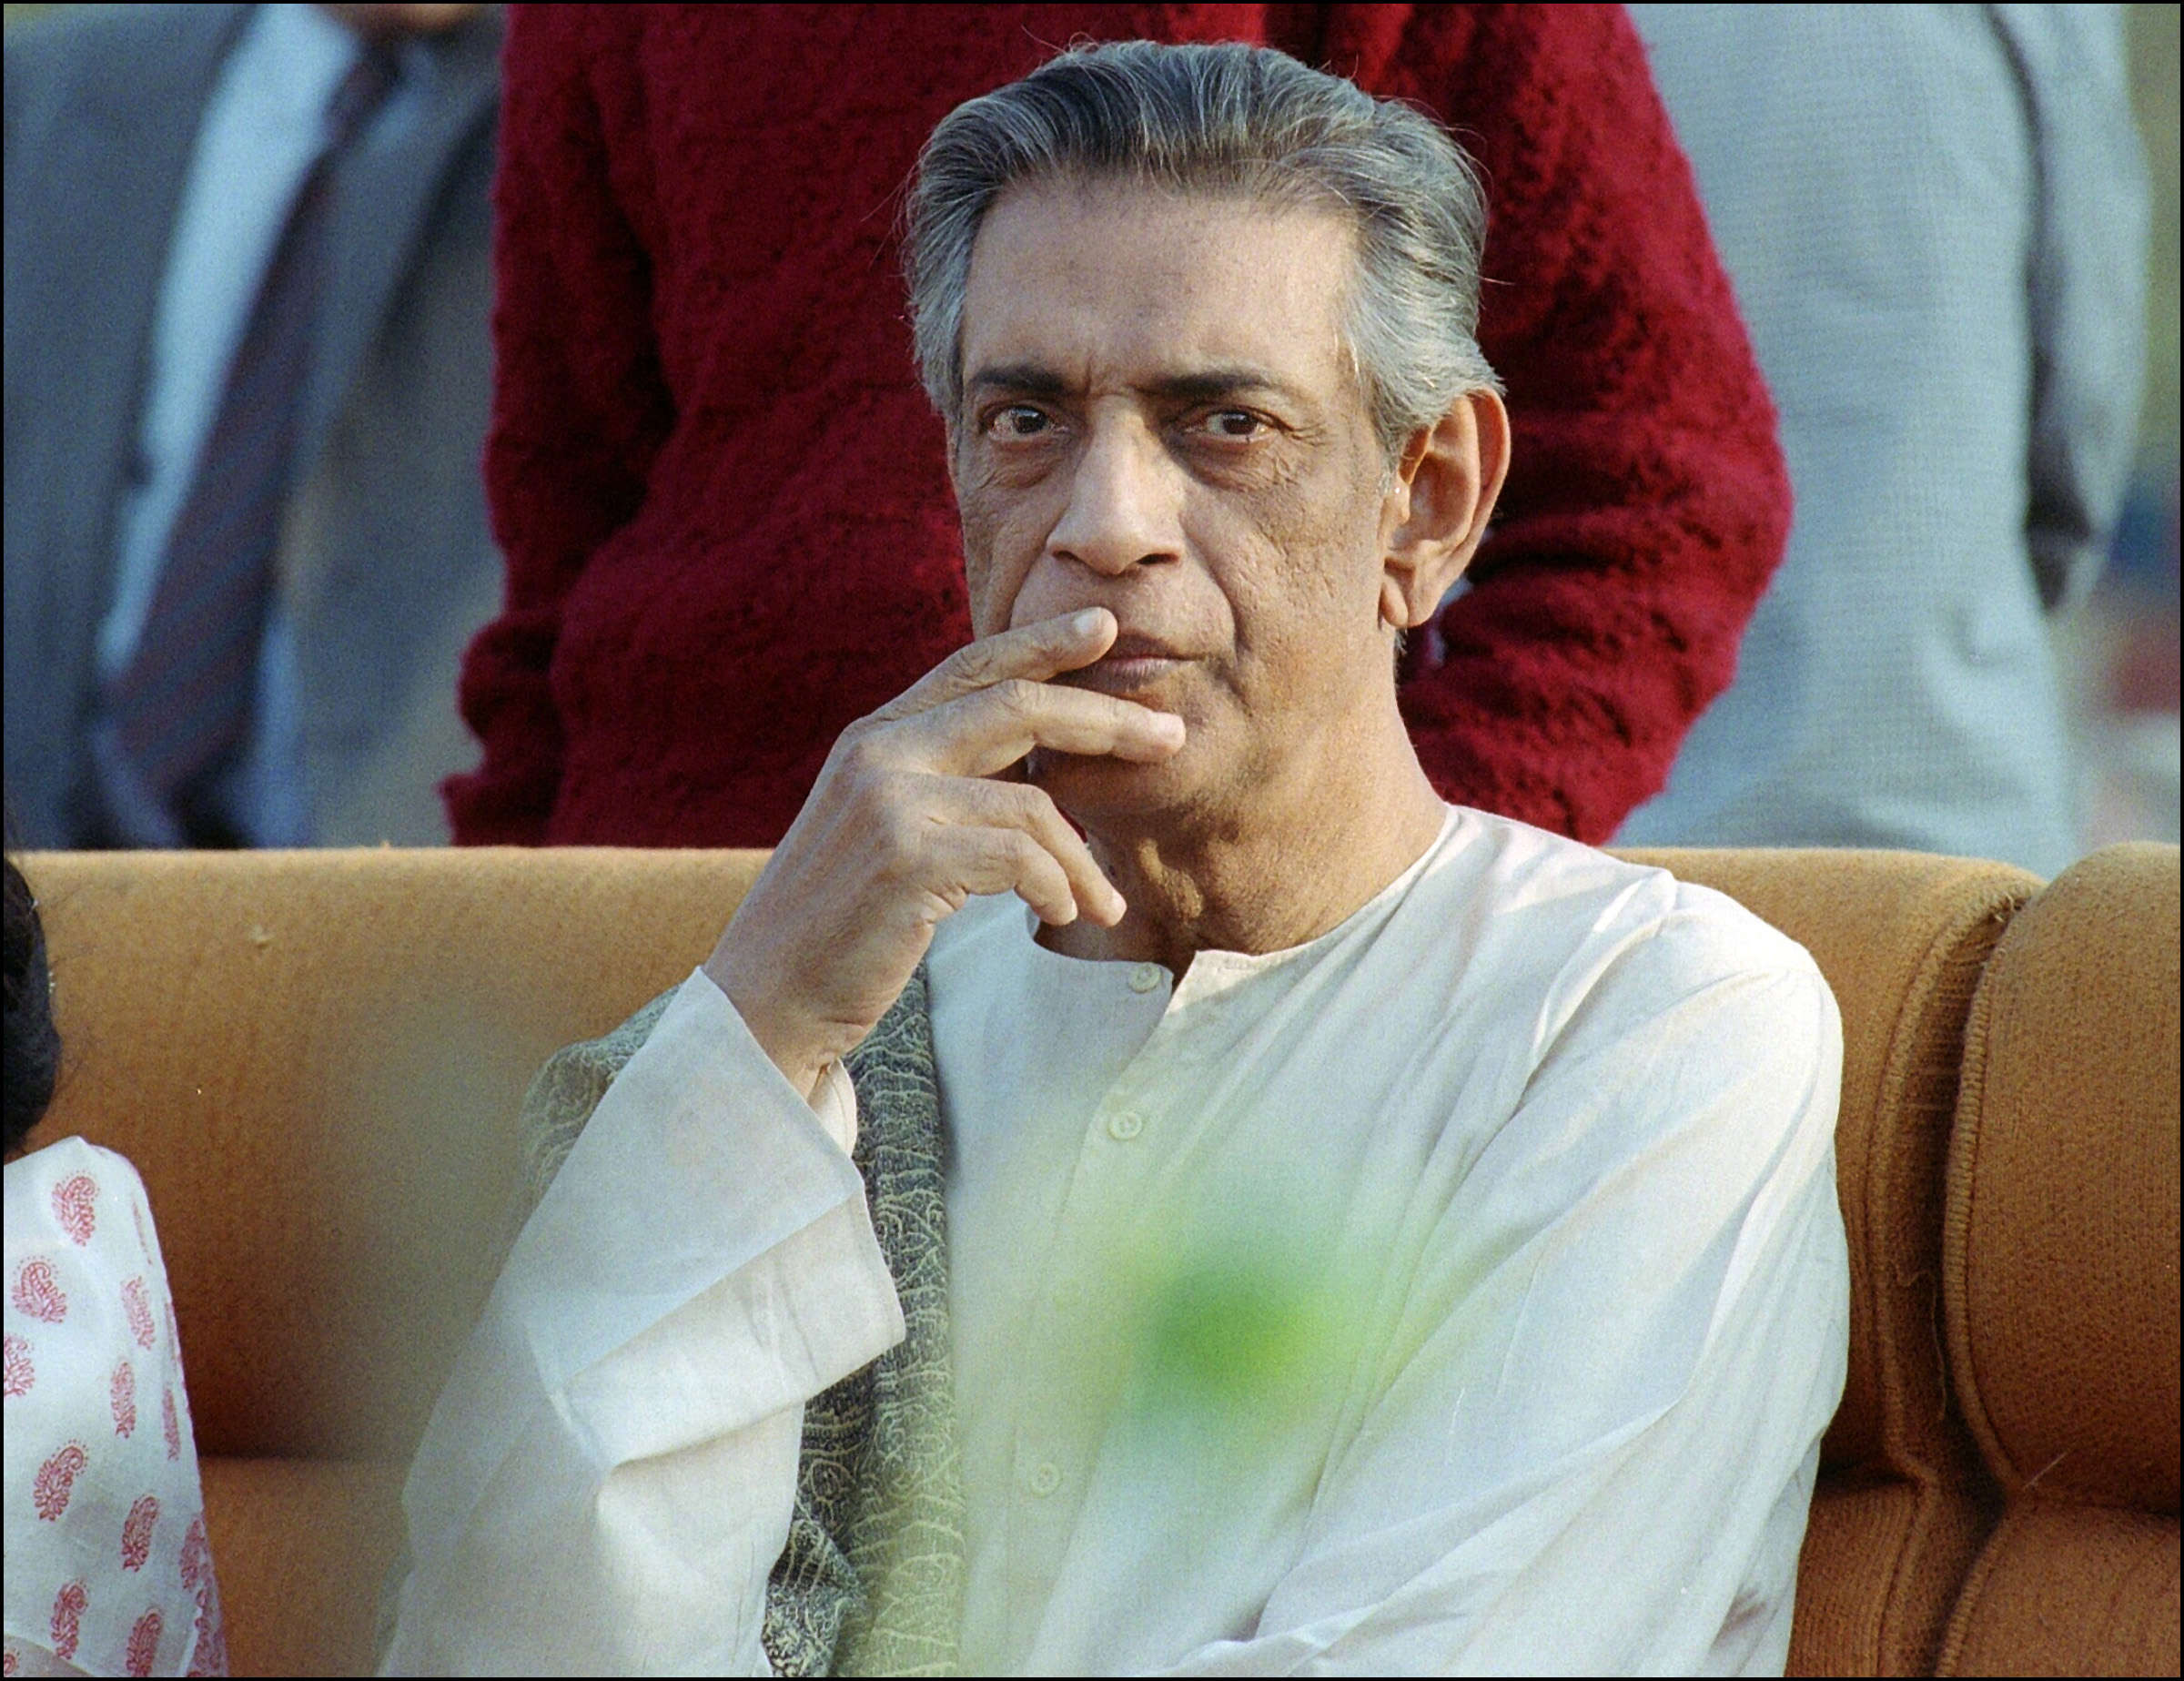 Portrait taken 02 February 1989 in Calcutta of the